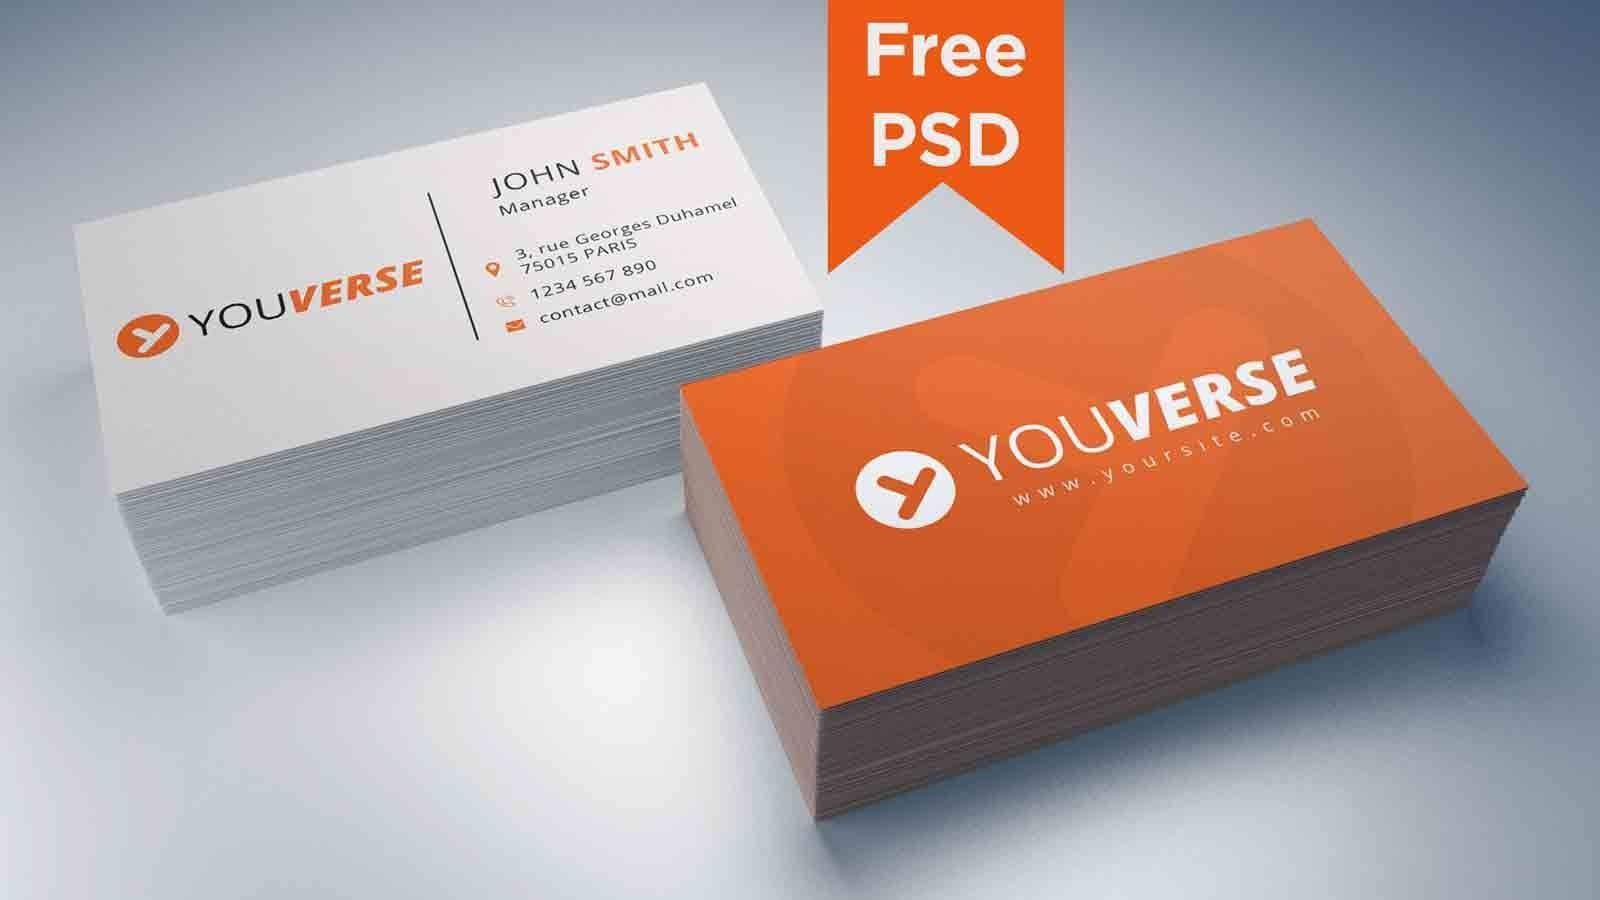 002 Shocking Simple Visiting Card Design Psd File Free Download Idea Full